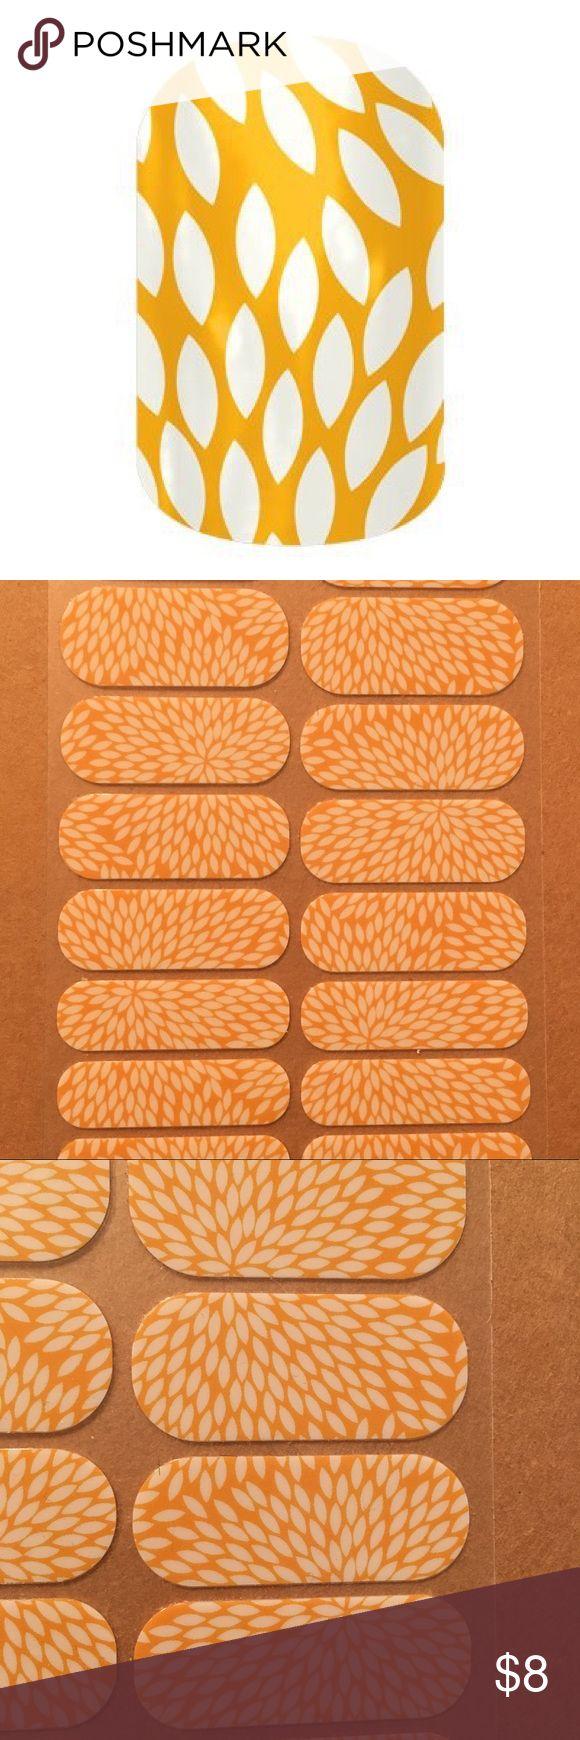 Sunny Lotus Jamberry Nail Wraps Full Sheet of Sunny Lotus Jamberry Nail Wraps. Jamberry Other